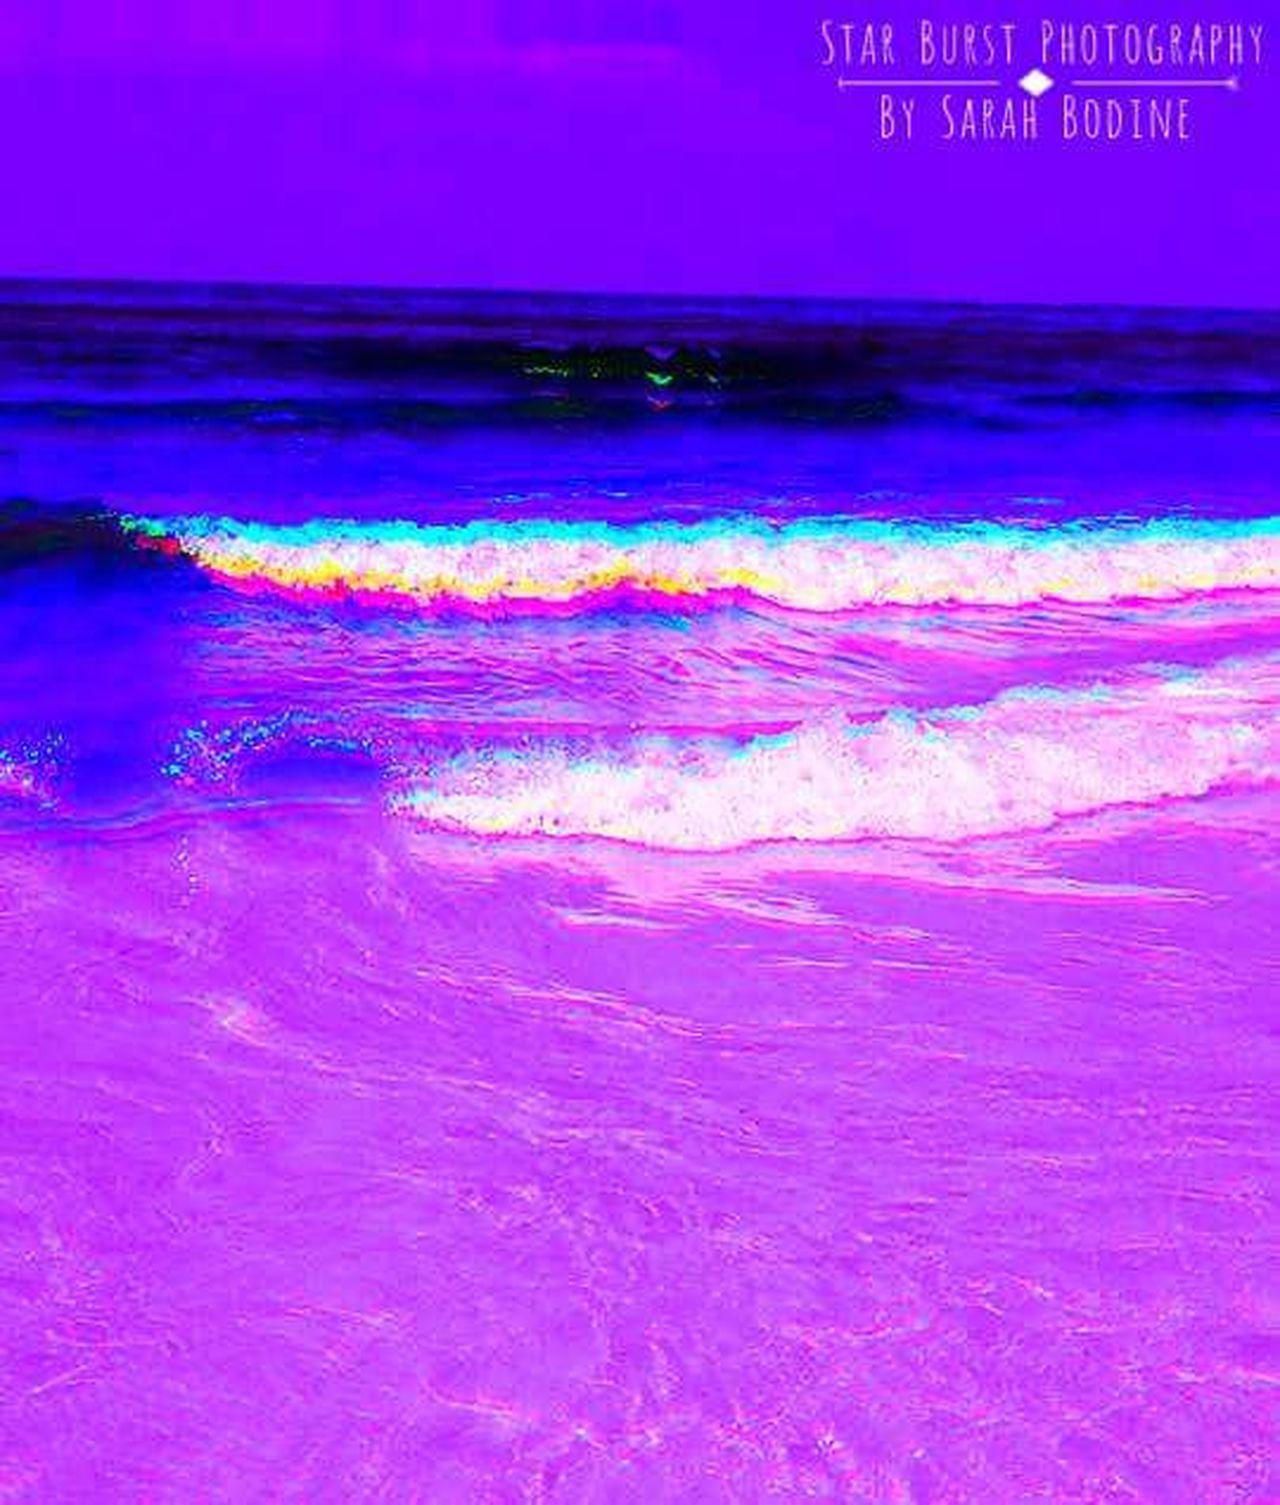 Purple Abstract StarBurstPhotography Nature Ocean Photography Digital Editing